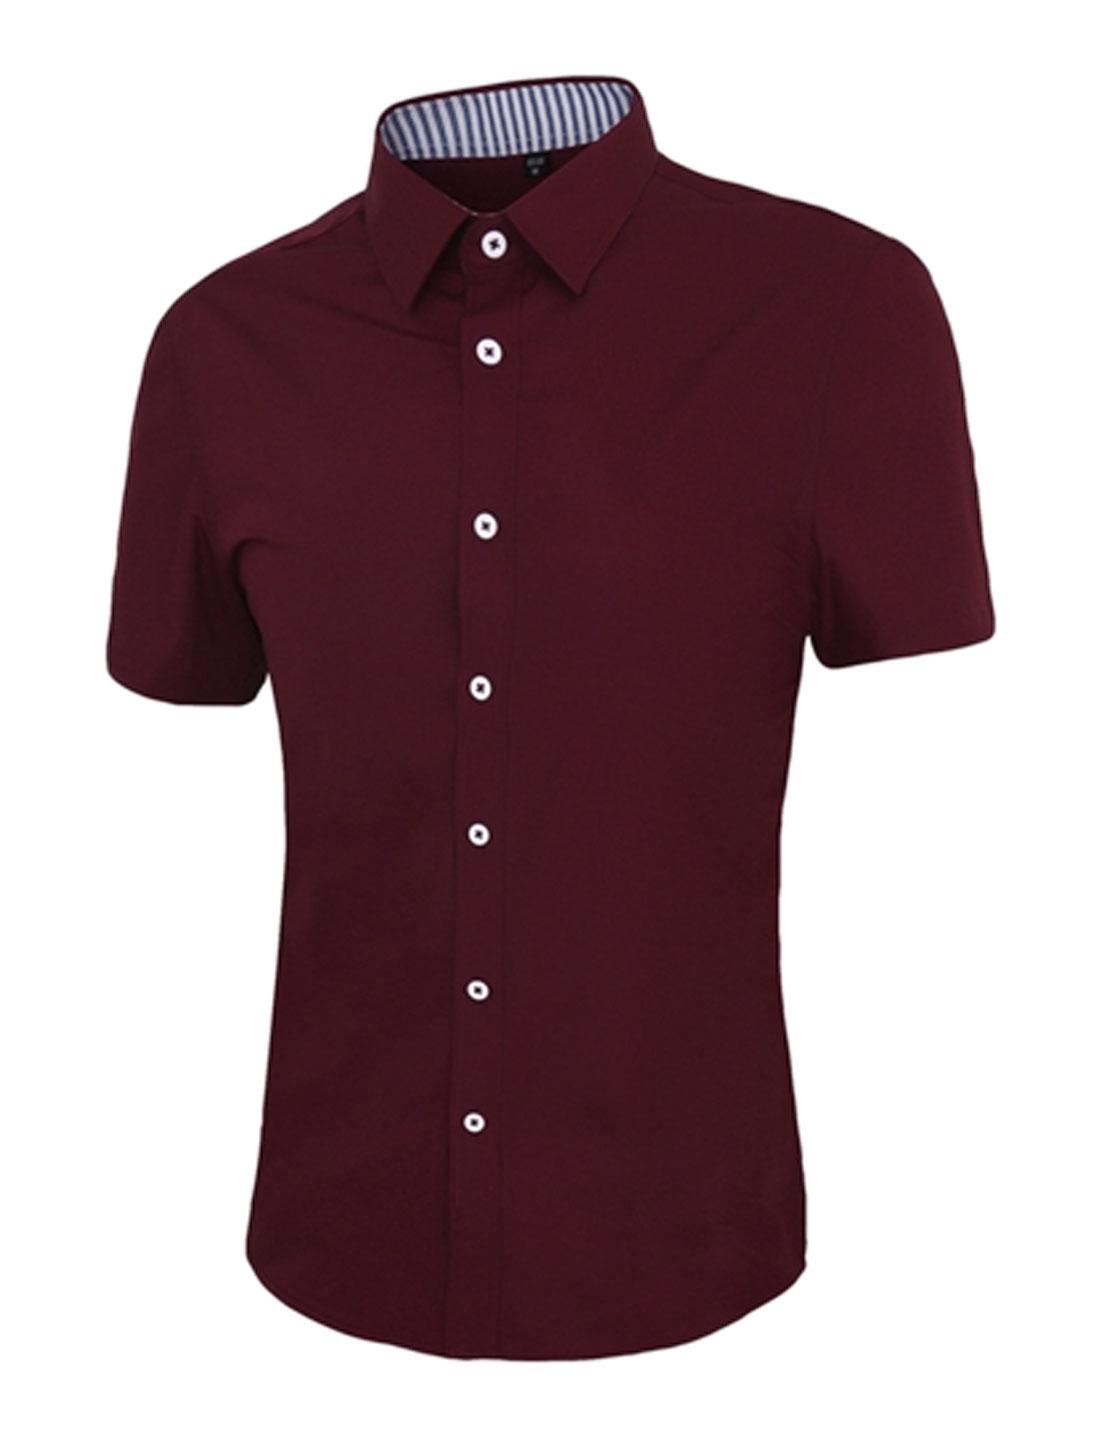 Men Short Sleeve Button Down Slim Fit Shirt Red S